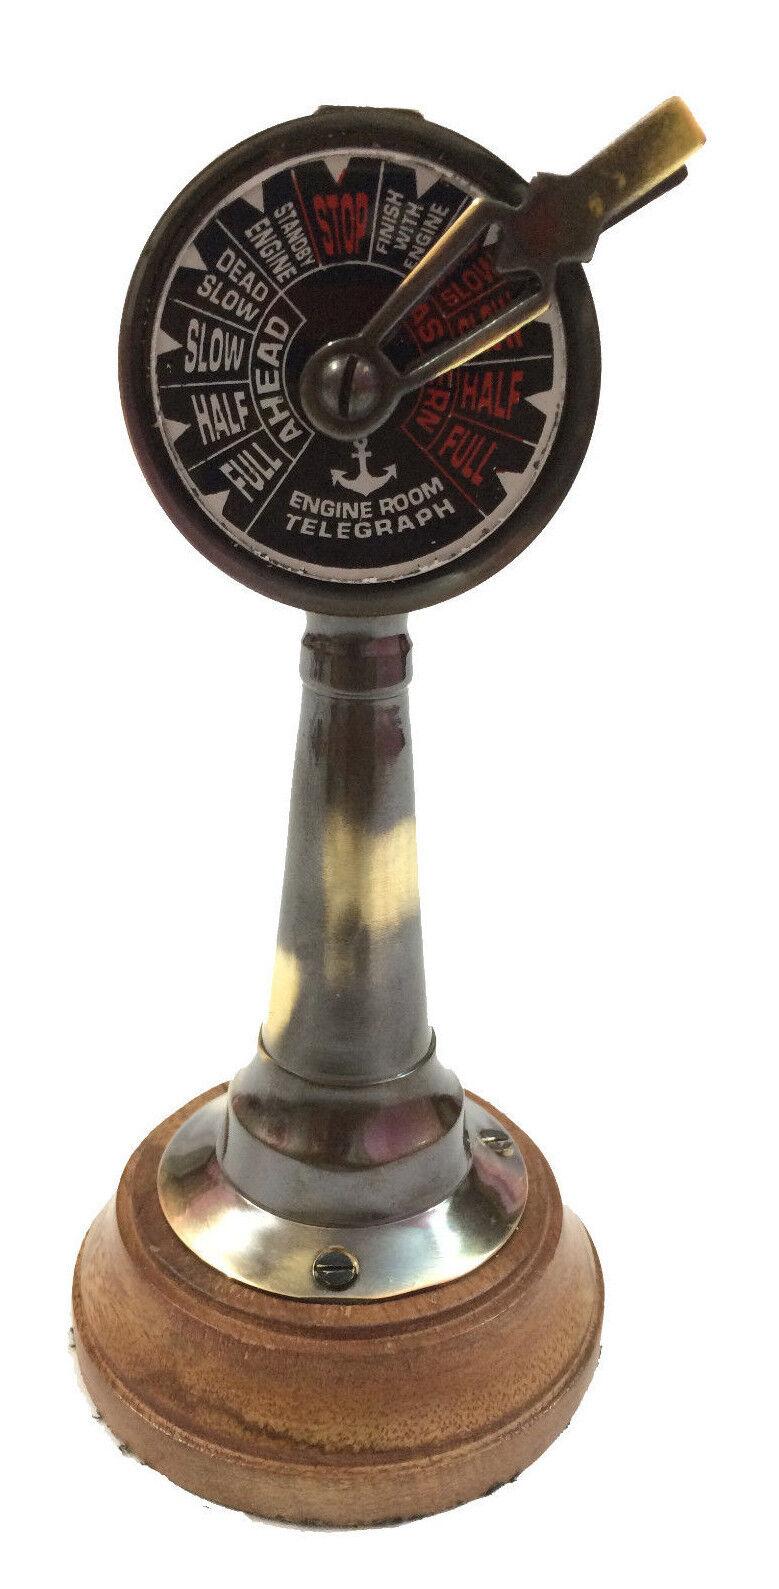 Battleship Engine Room: Nautical Antique Marine Telegraph Ship Engine Room